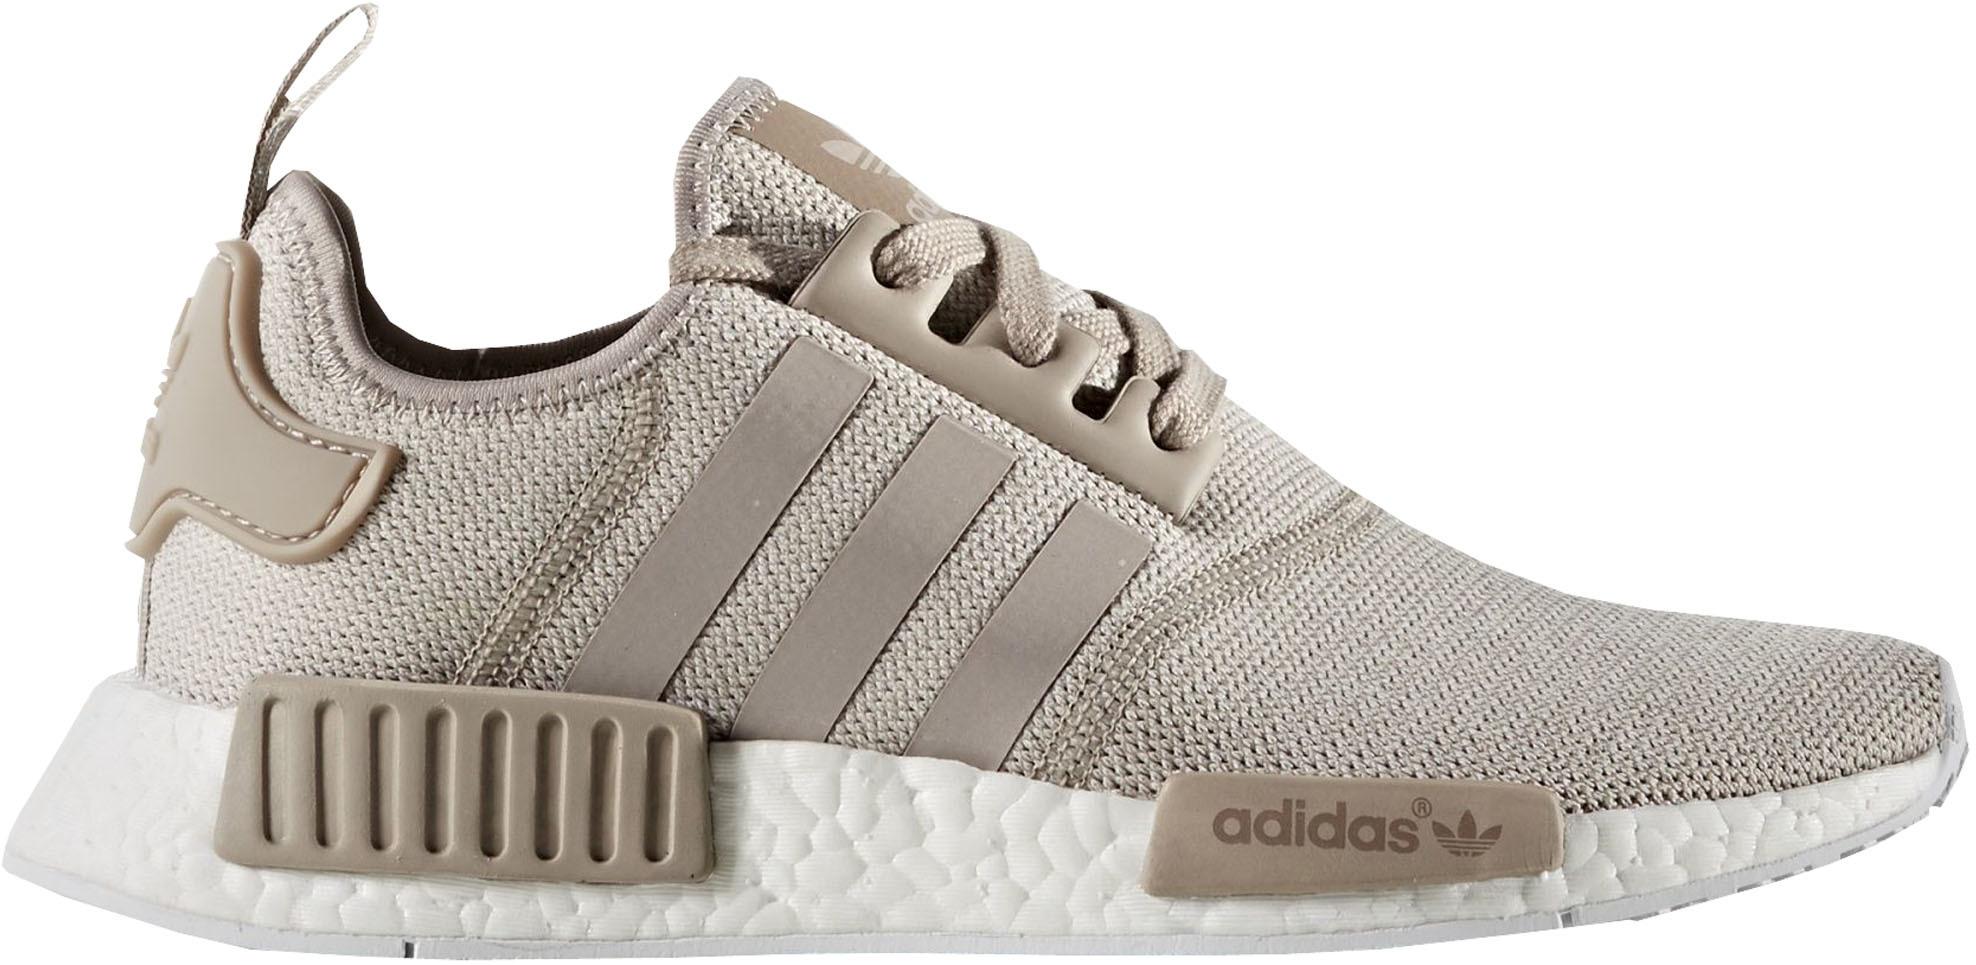 adidas nmd c1 mens Grey